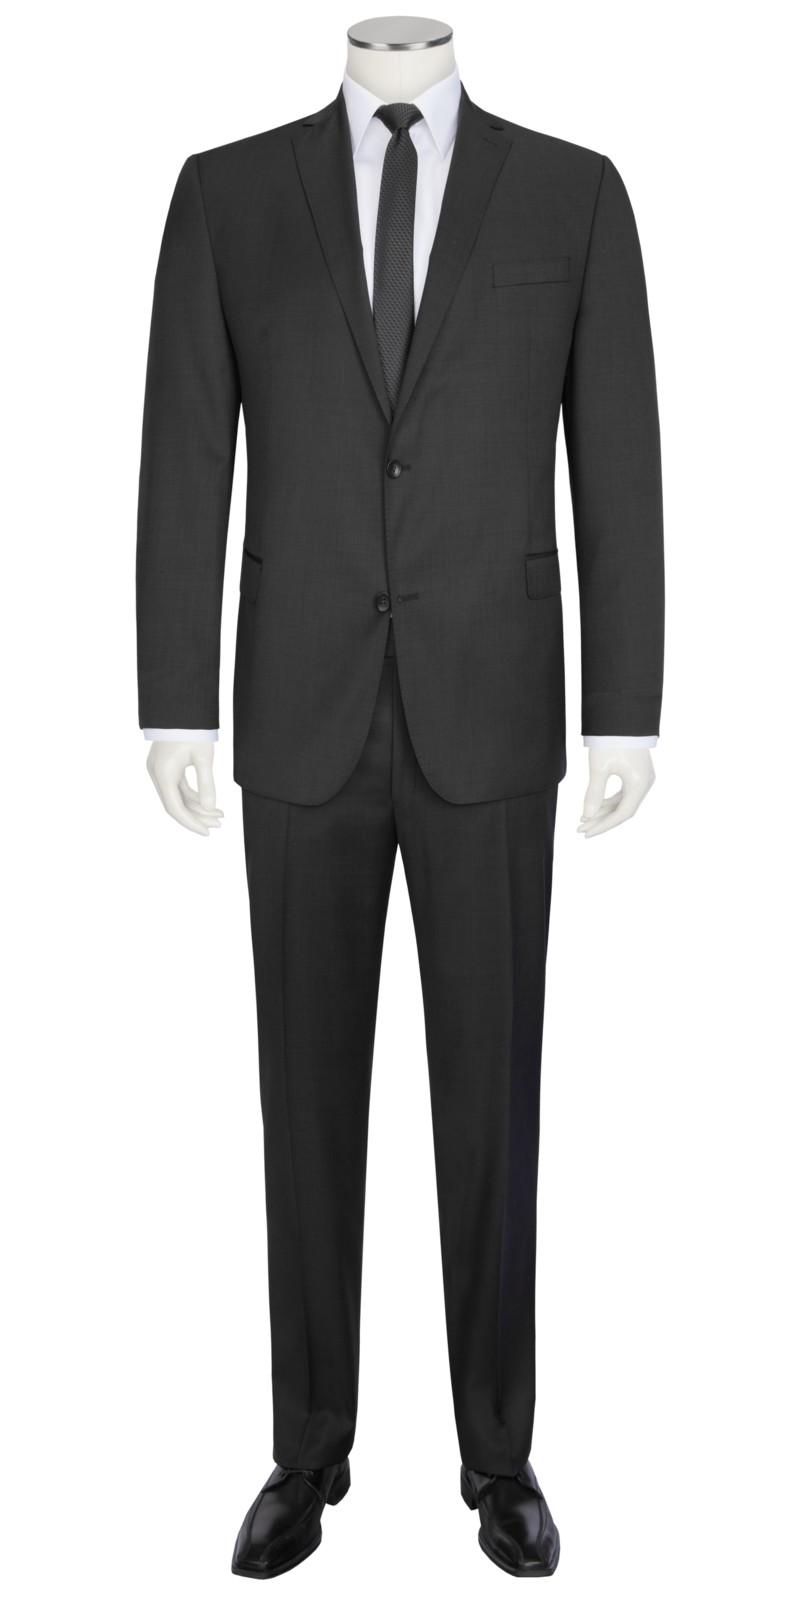 carl gross smarter anzug mit dezenter struktur schwarz. Black Bedroom Furniture Sets. Home Design Ideas